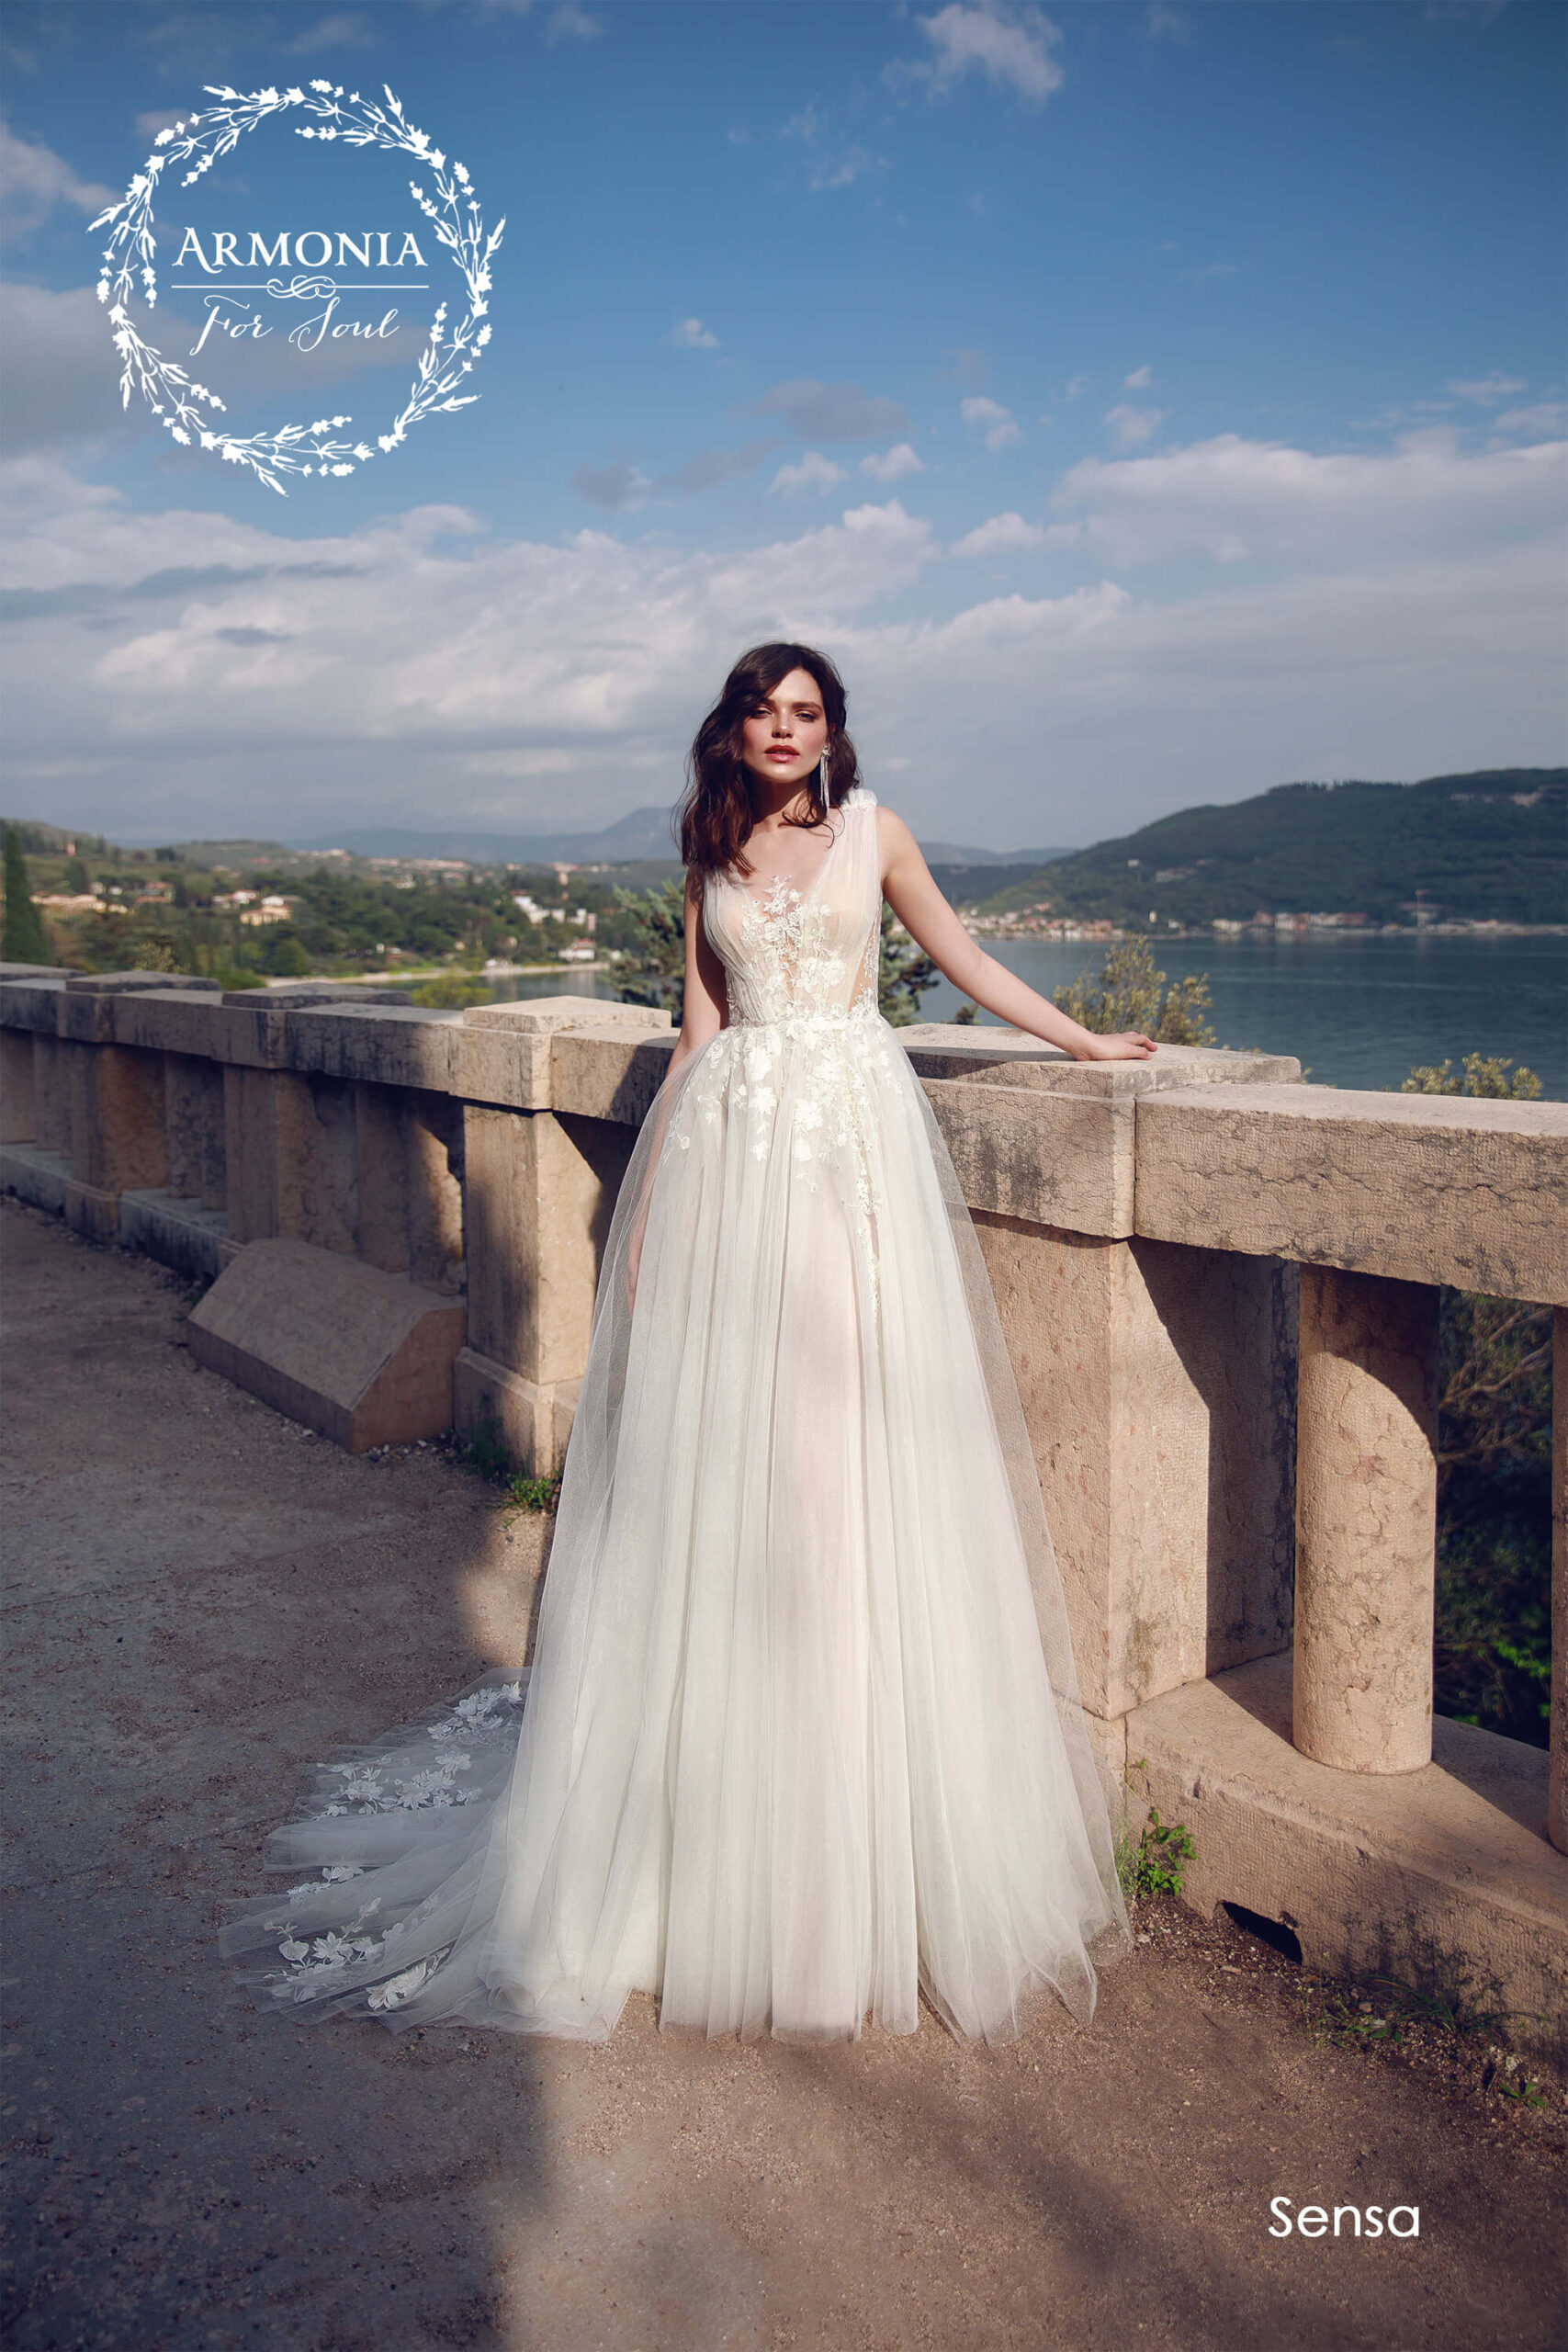 Cвадебное платье Sensa Armonia